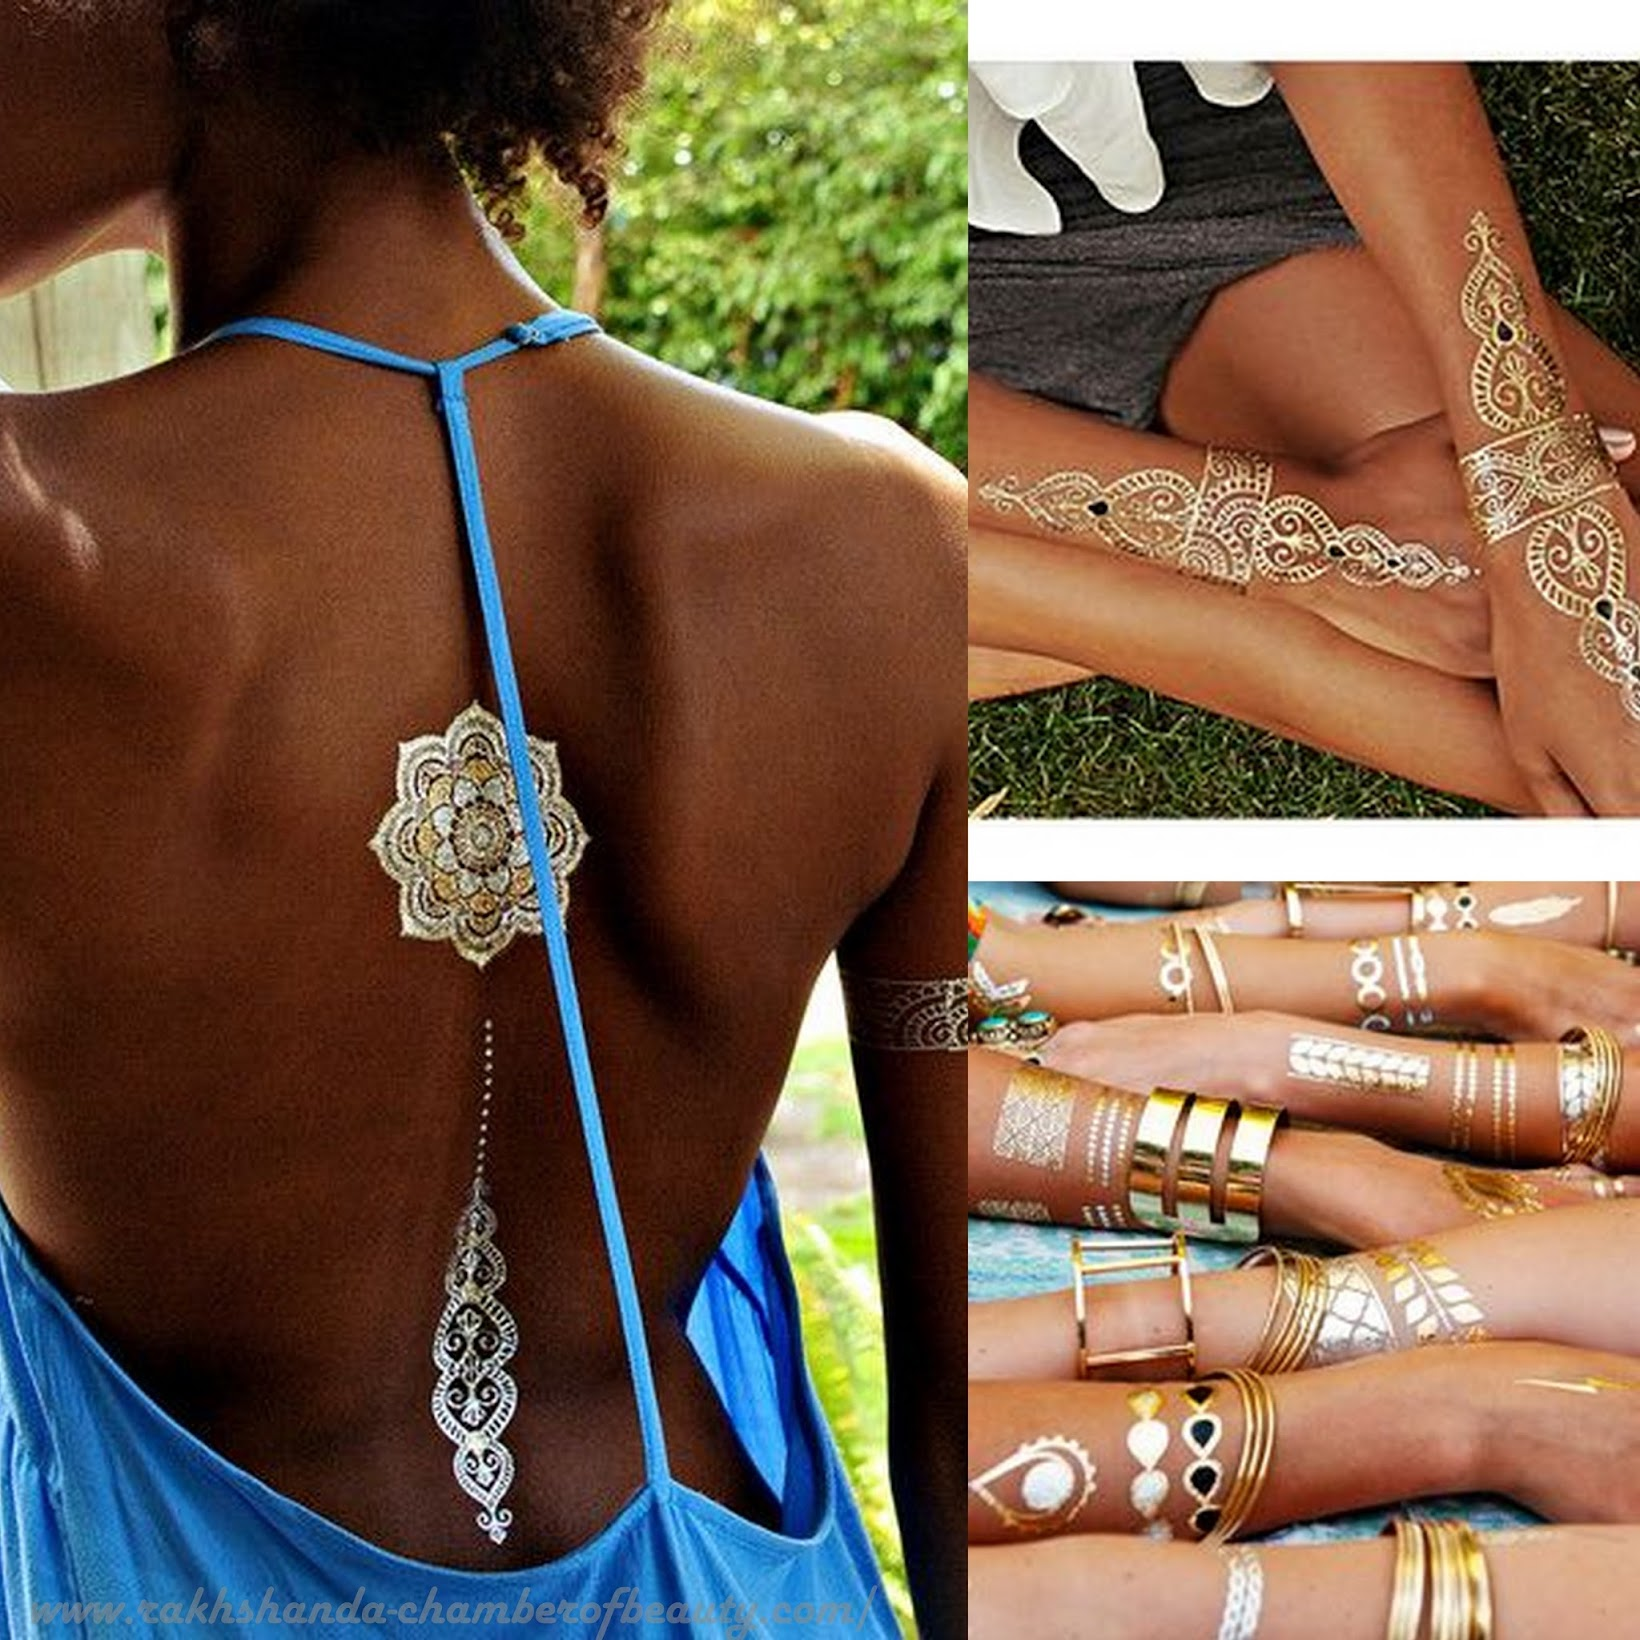 Fashion trends 2015- Metallic Flash tattoos   Stylemoi Giveaway, How to wear Metallic Flash tattoos, Style tips, Indian Fashion blogger, Chamber of Beauty